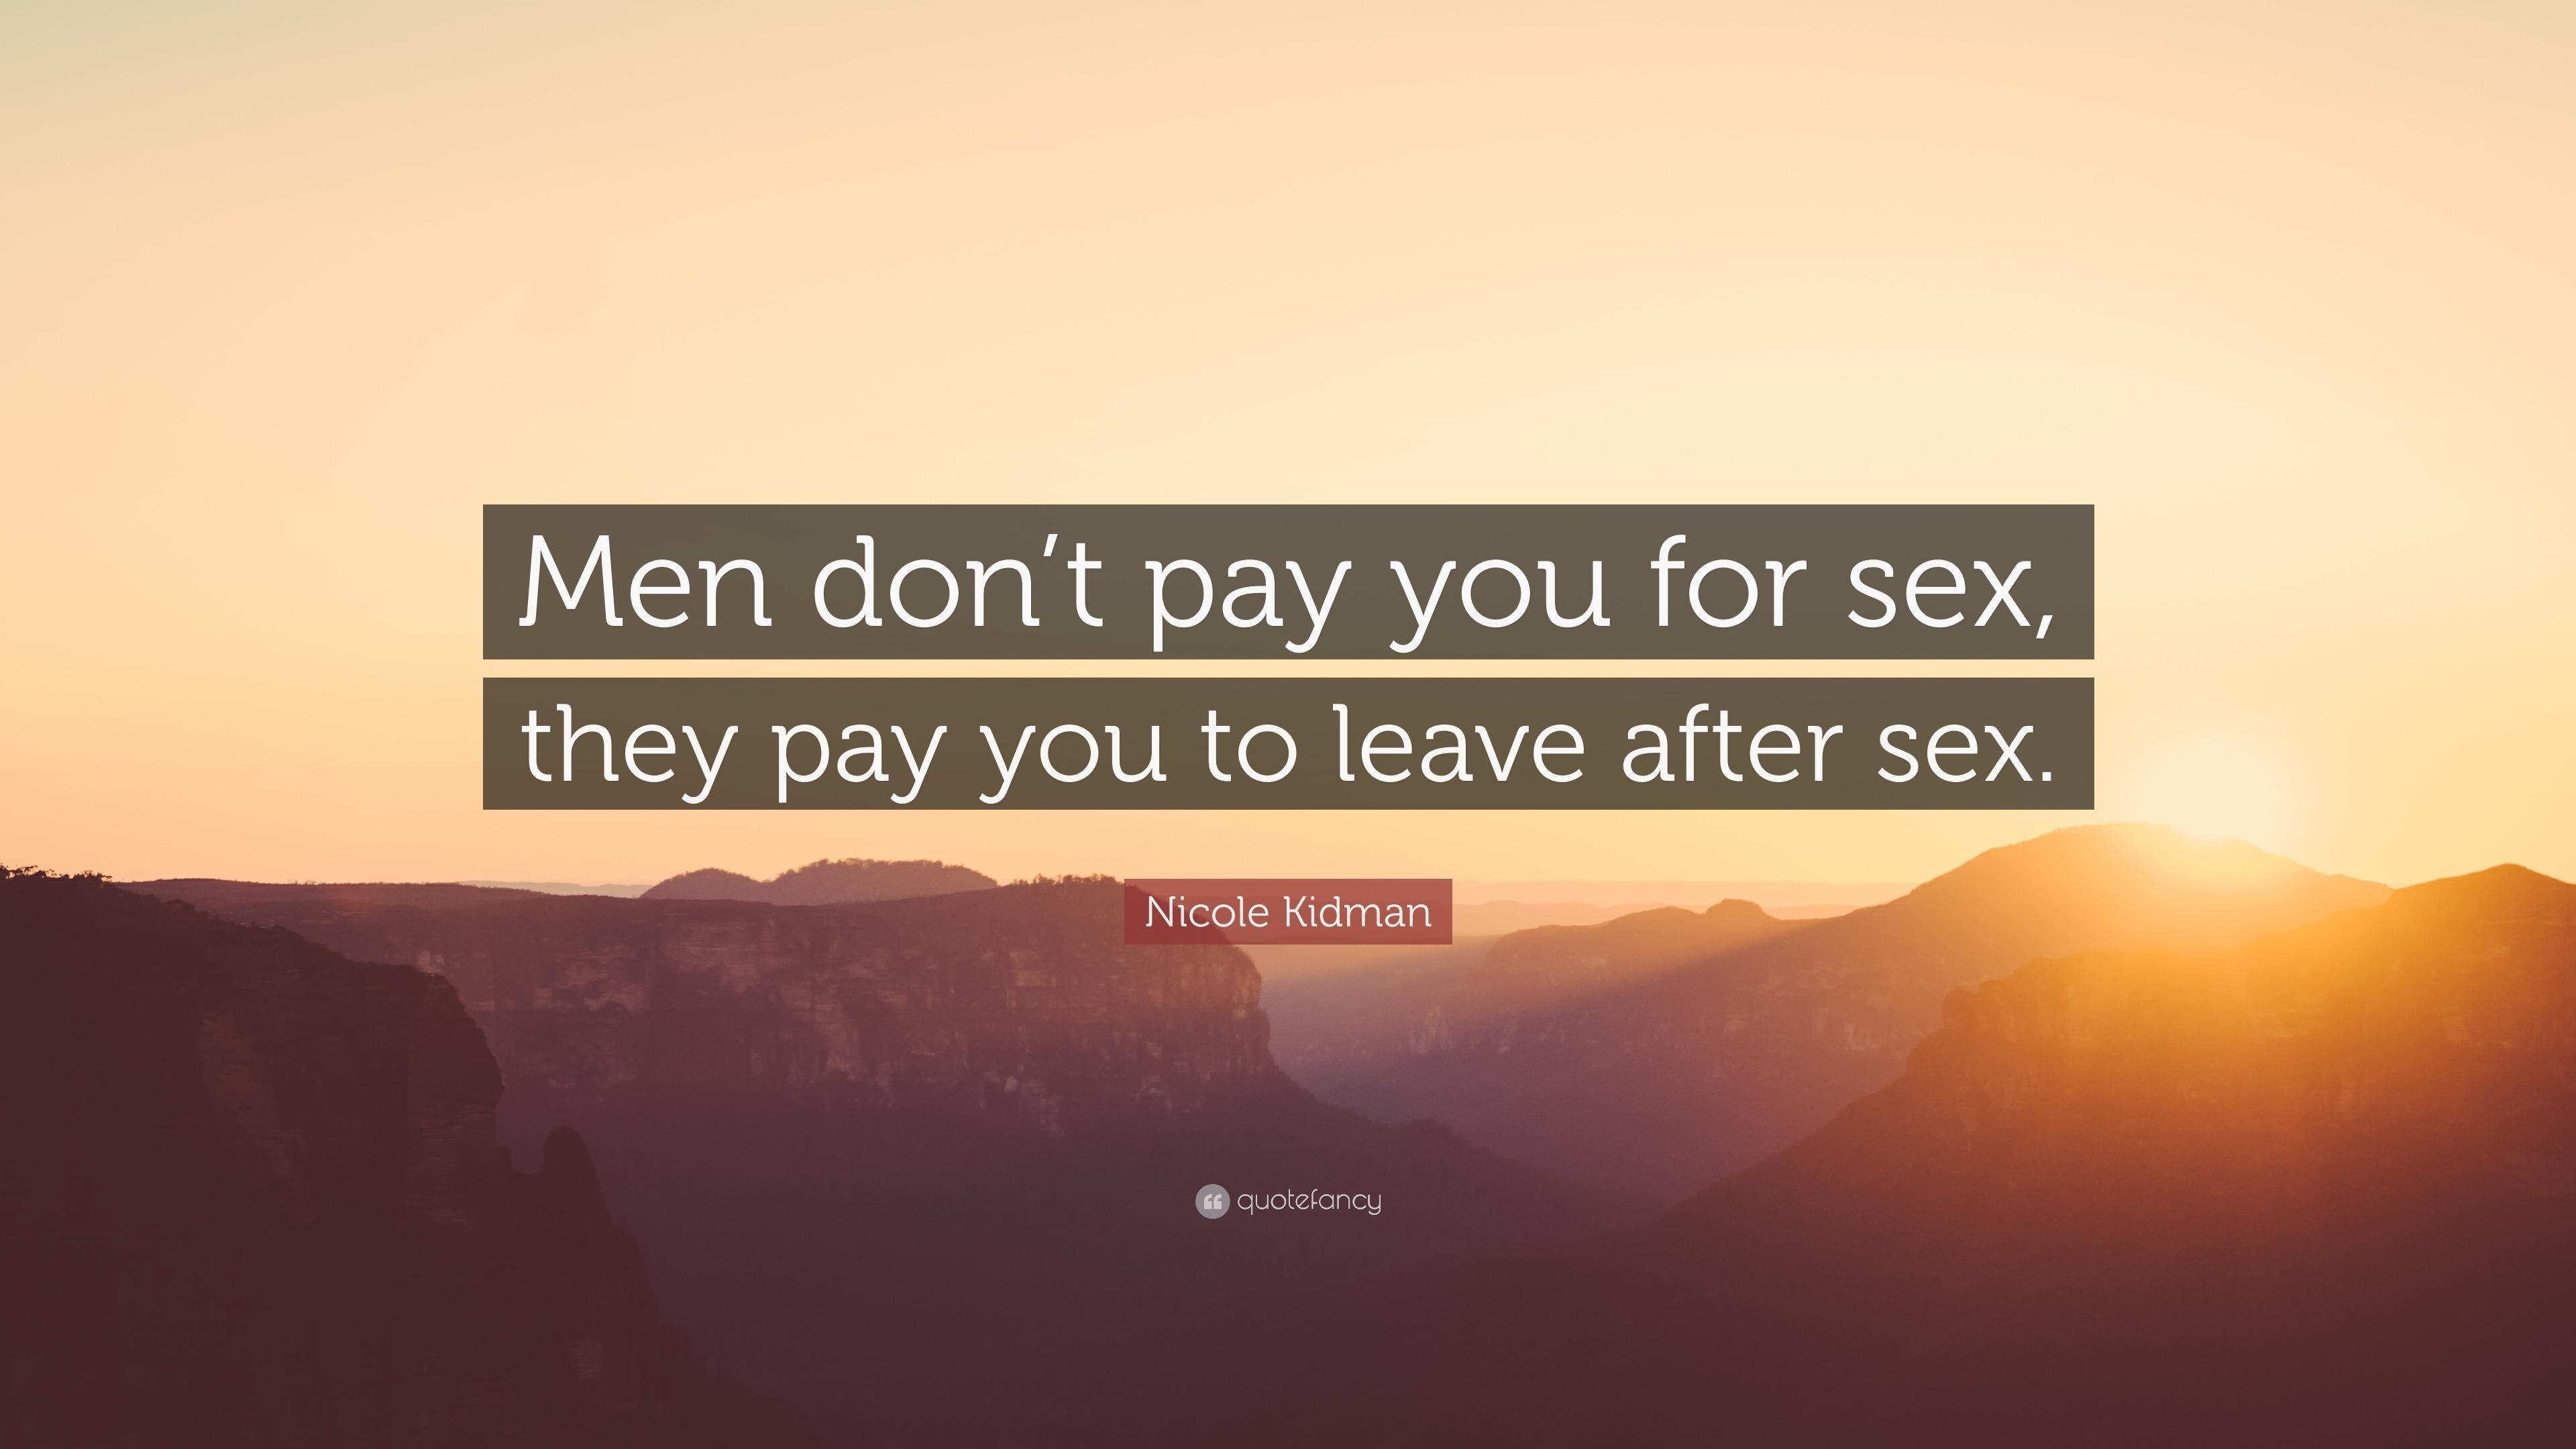 Why men leave after sex